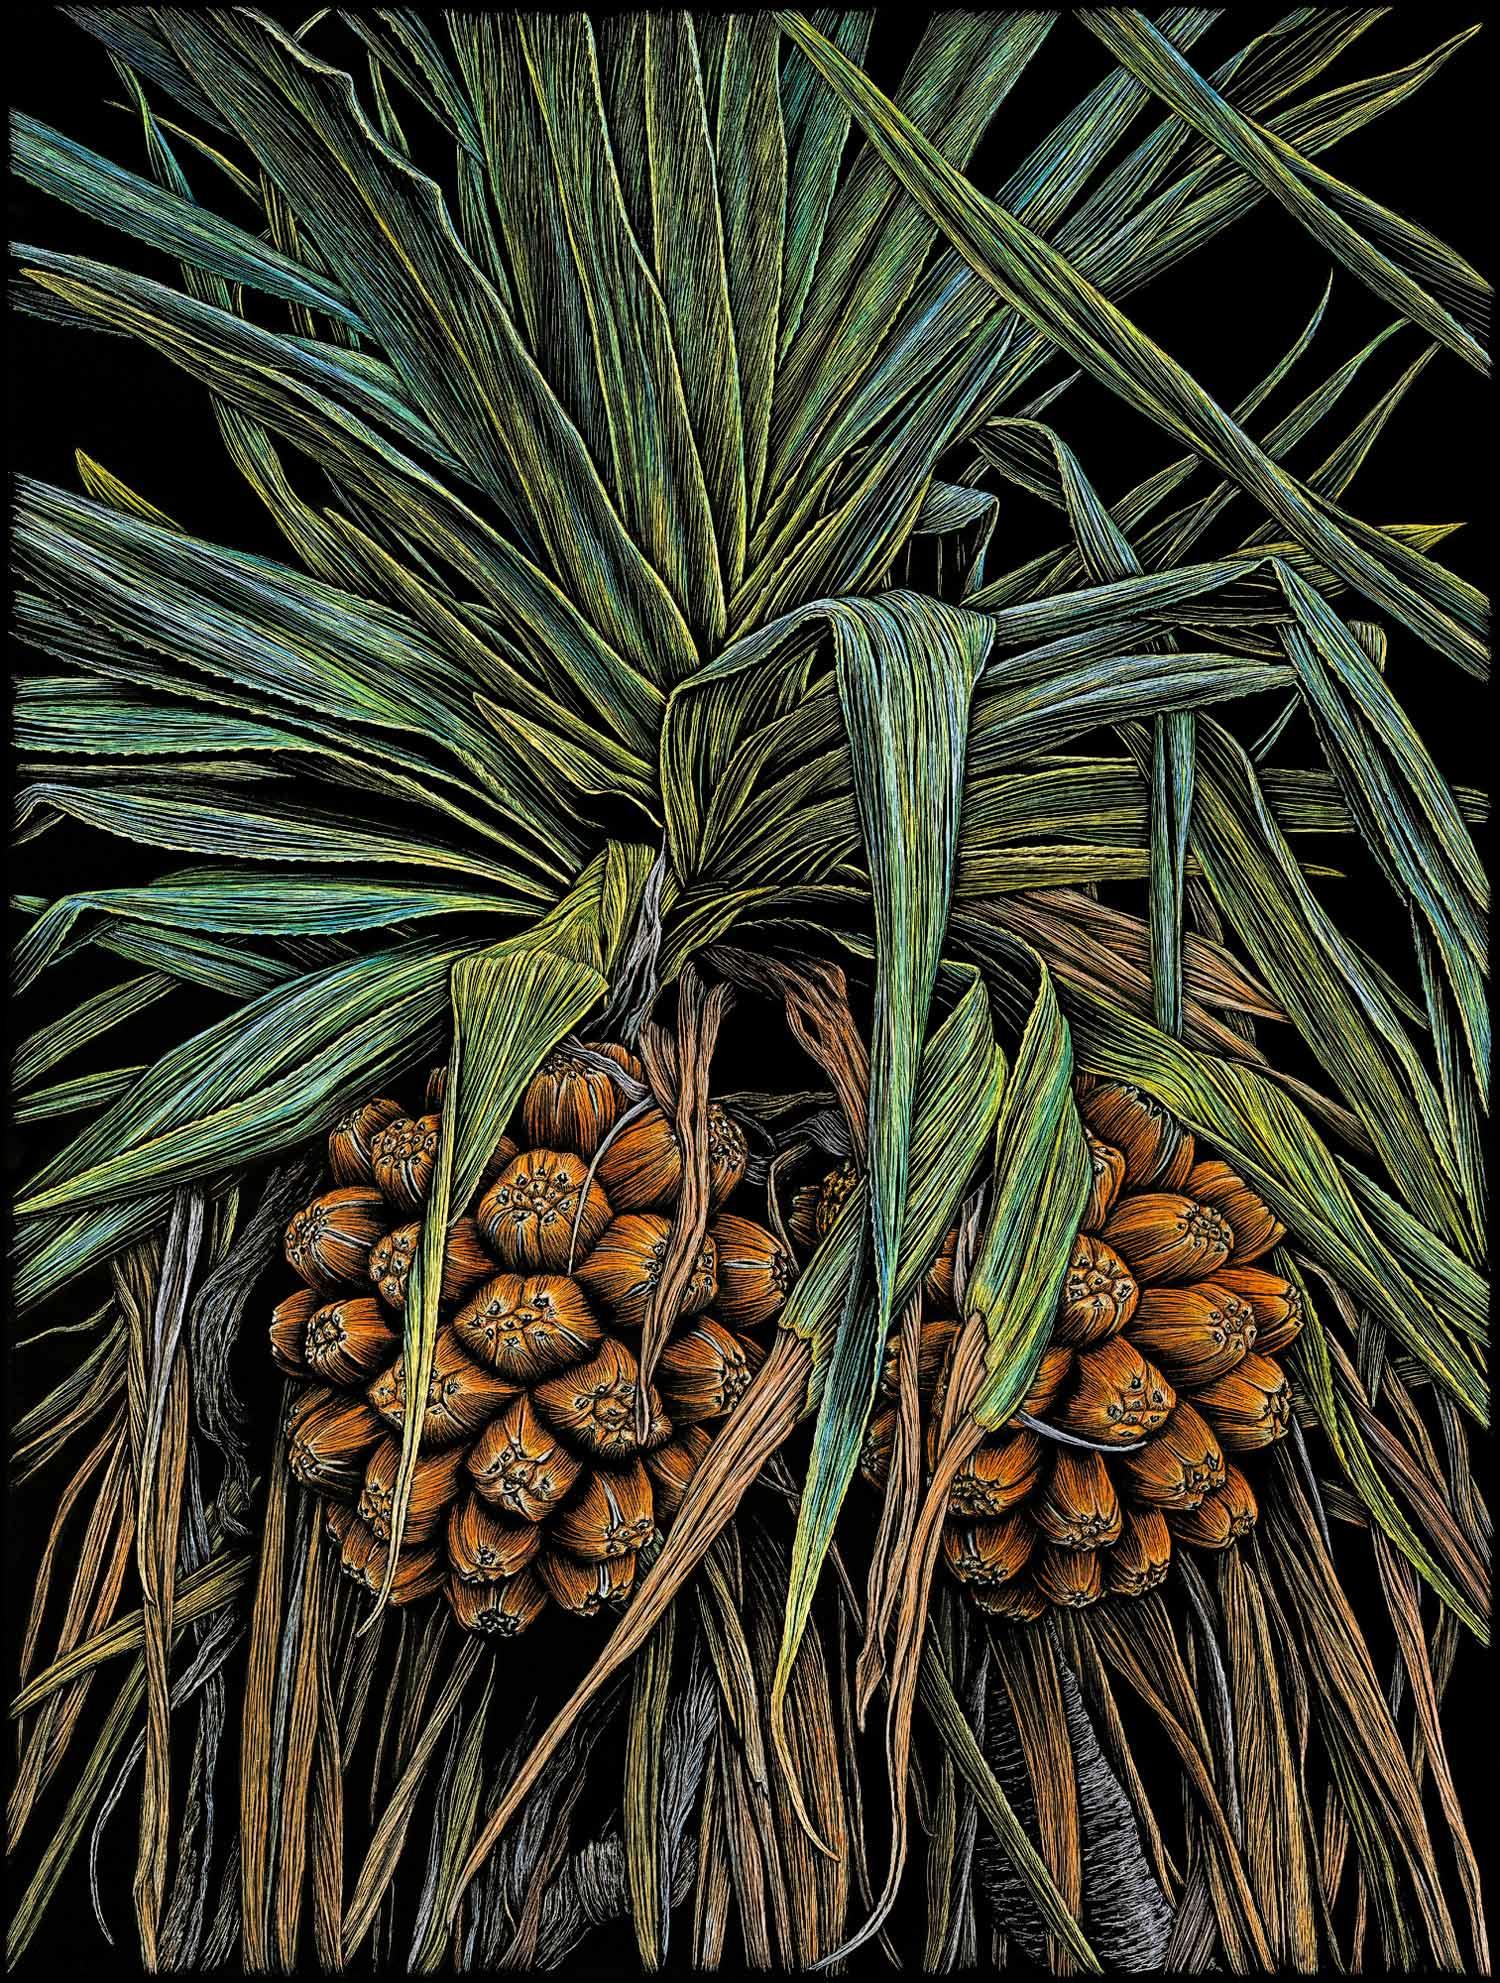 pandanus-palm-beach-colour-engraving-rachel-newling.jpg